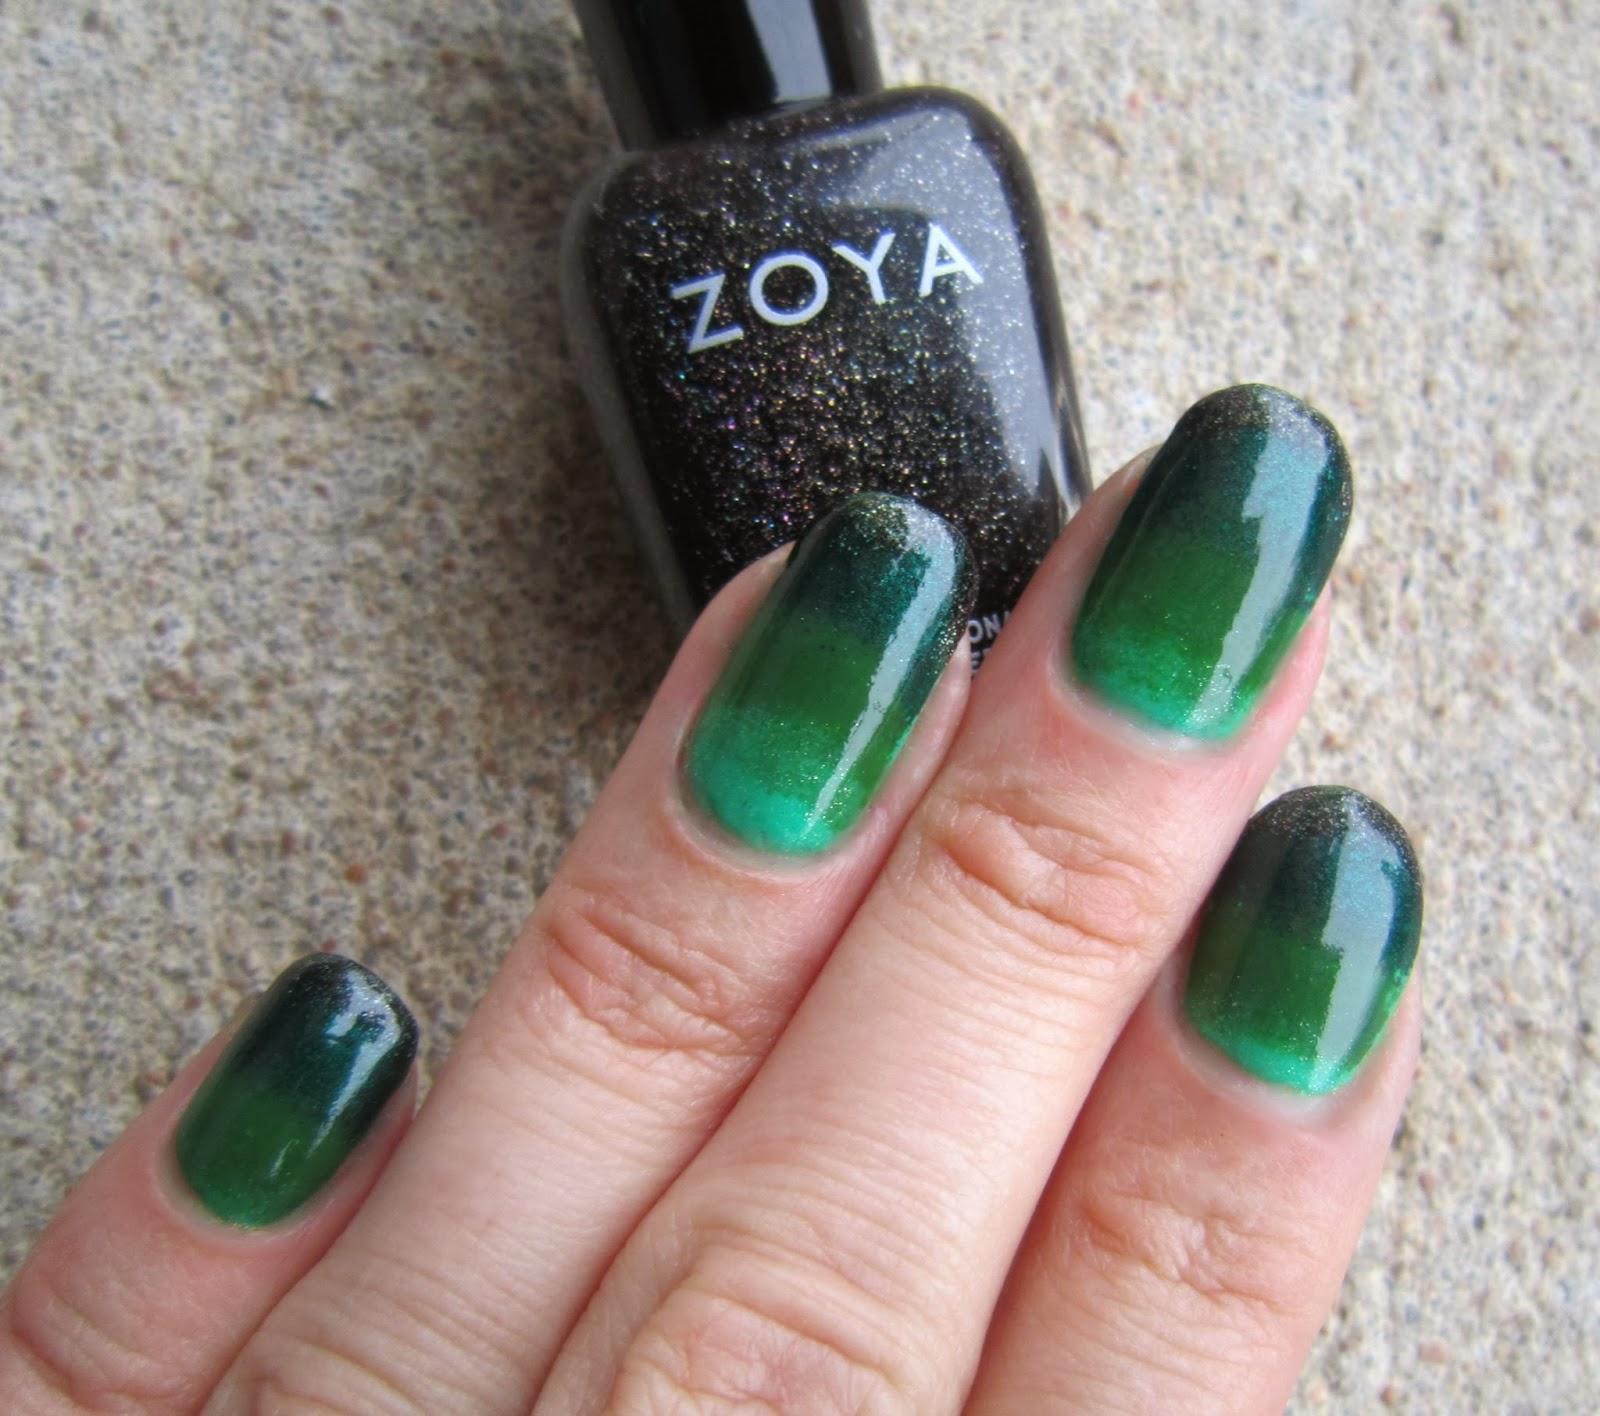 Concrete And Nail Polish Striped Nail Art: Concrete And Nail Polish: Green Gradient Nails